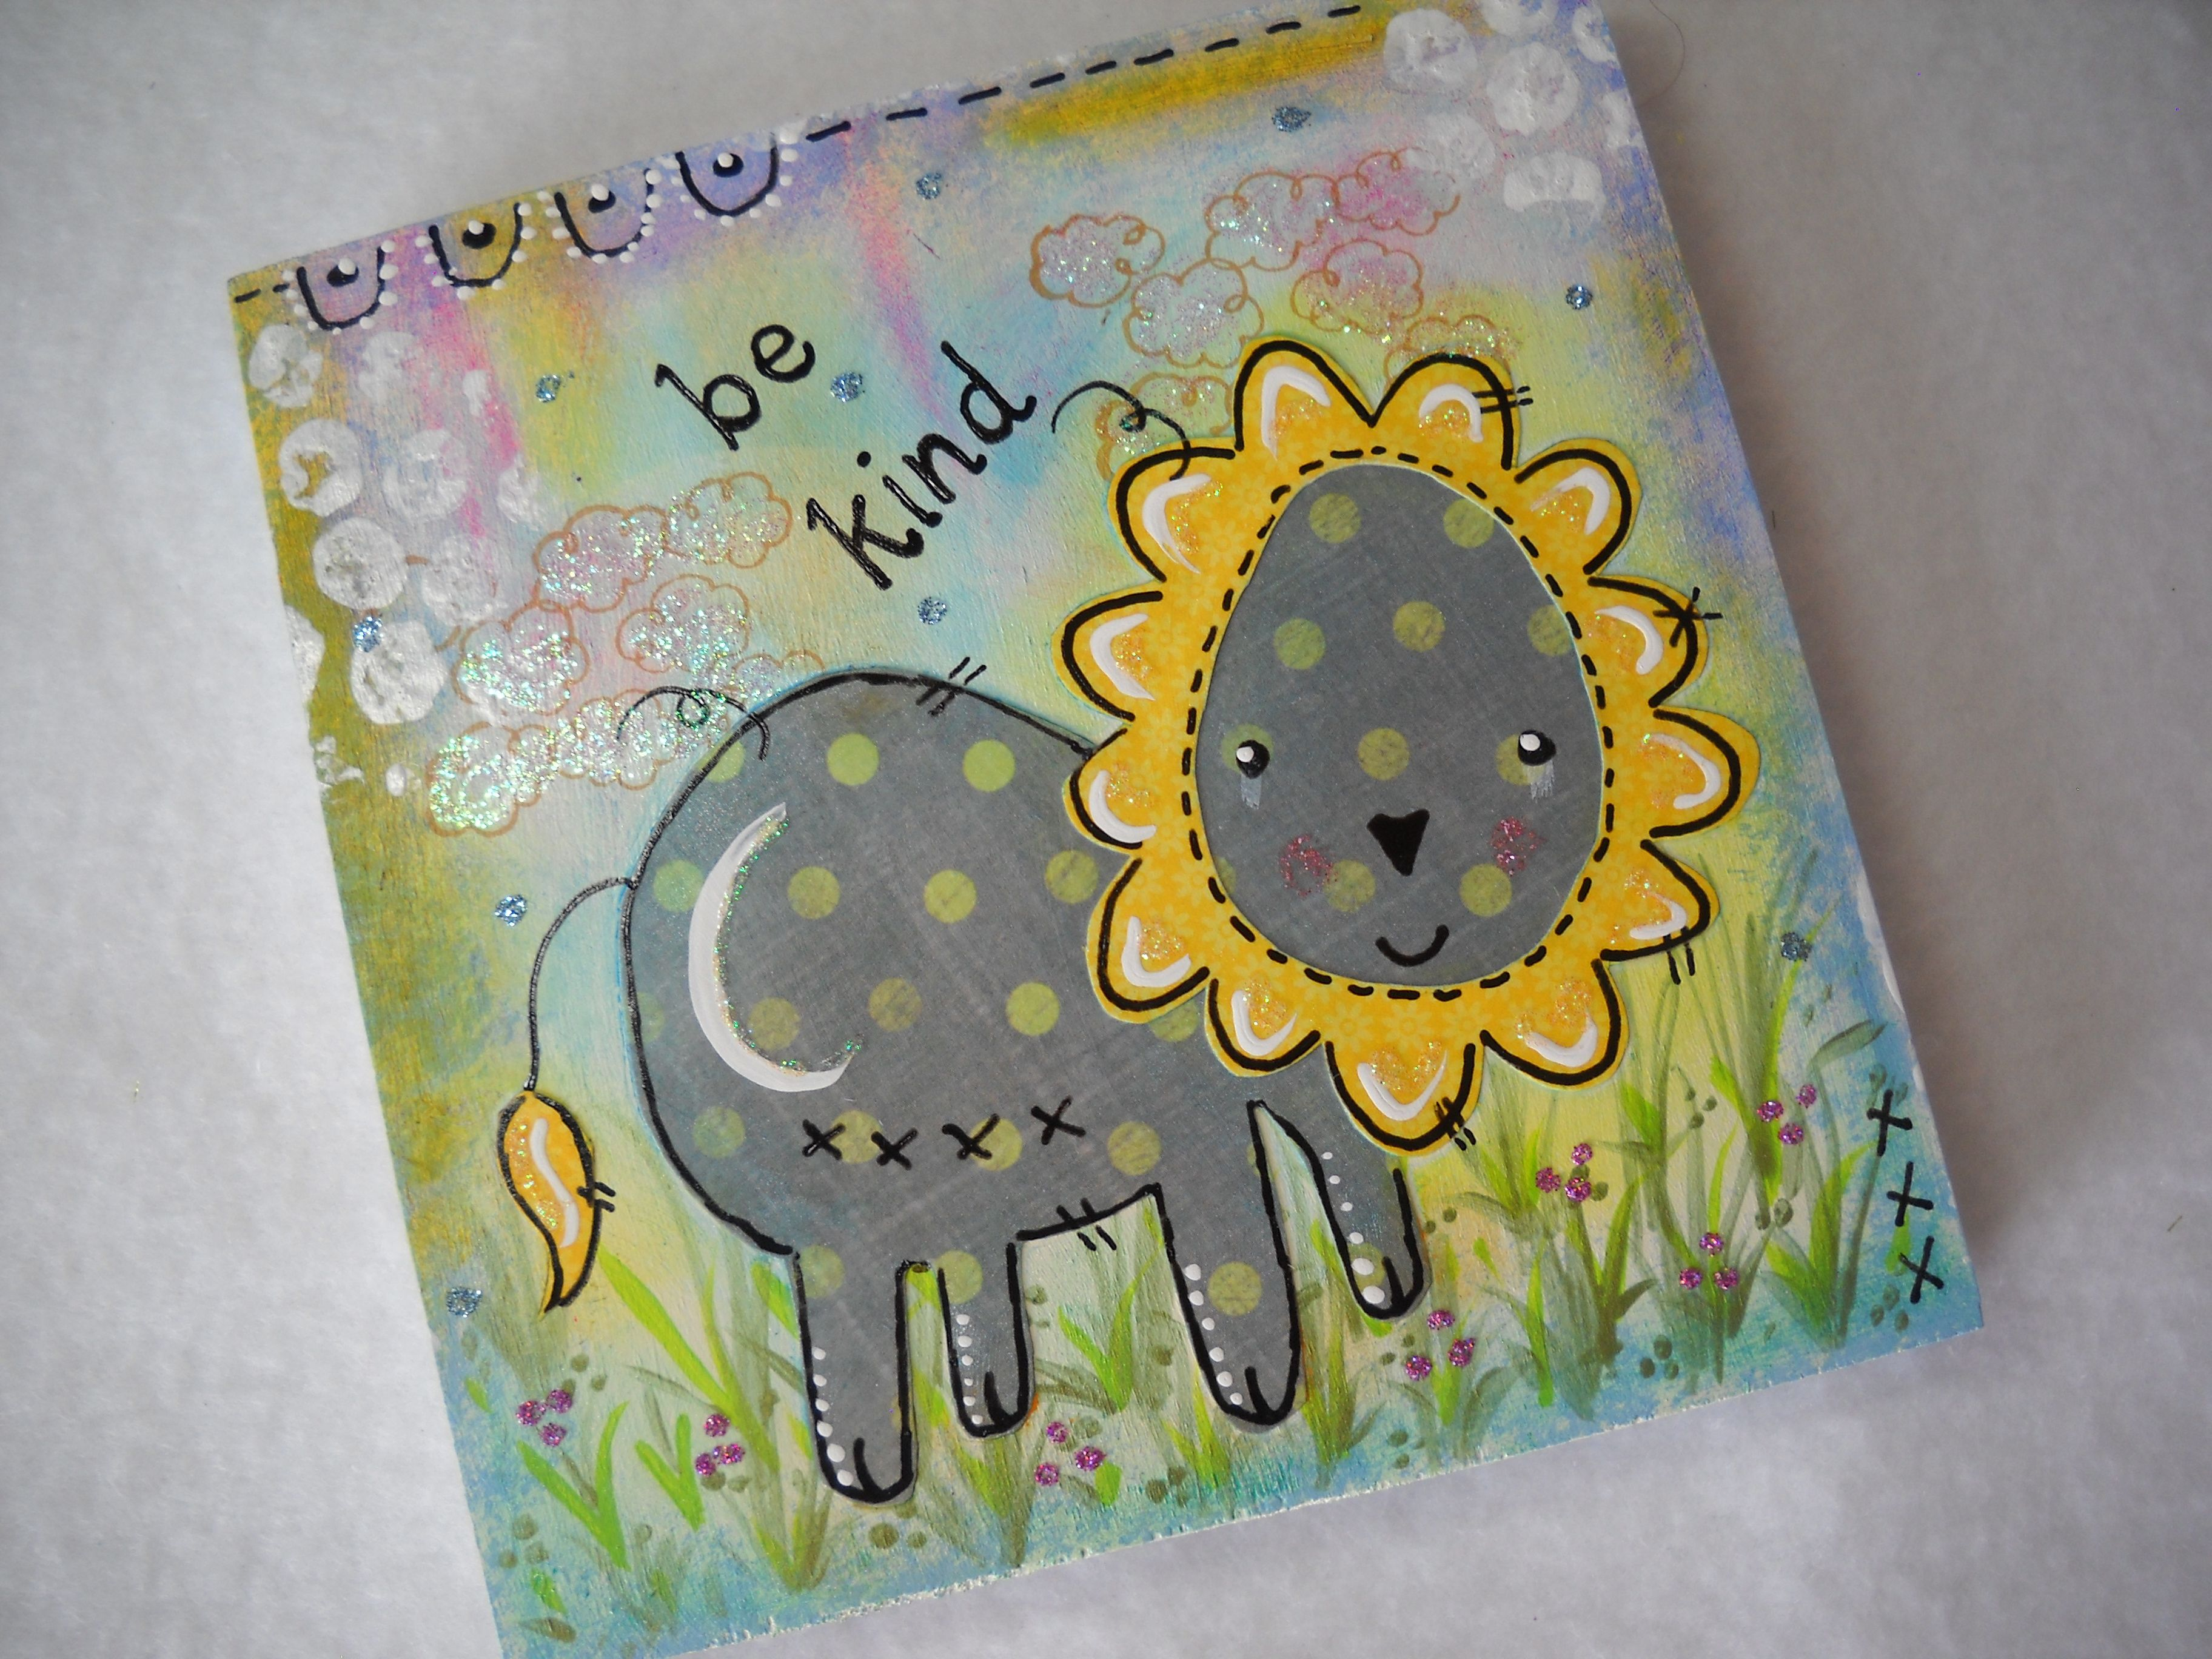 Original mixed media art baby lion kindness glittery clouds flowers